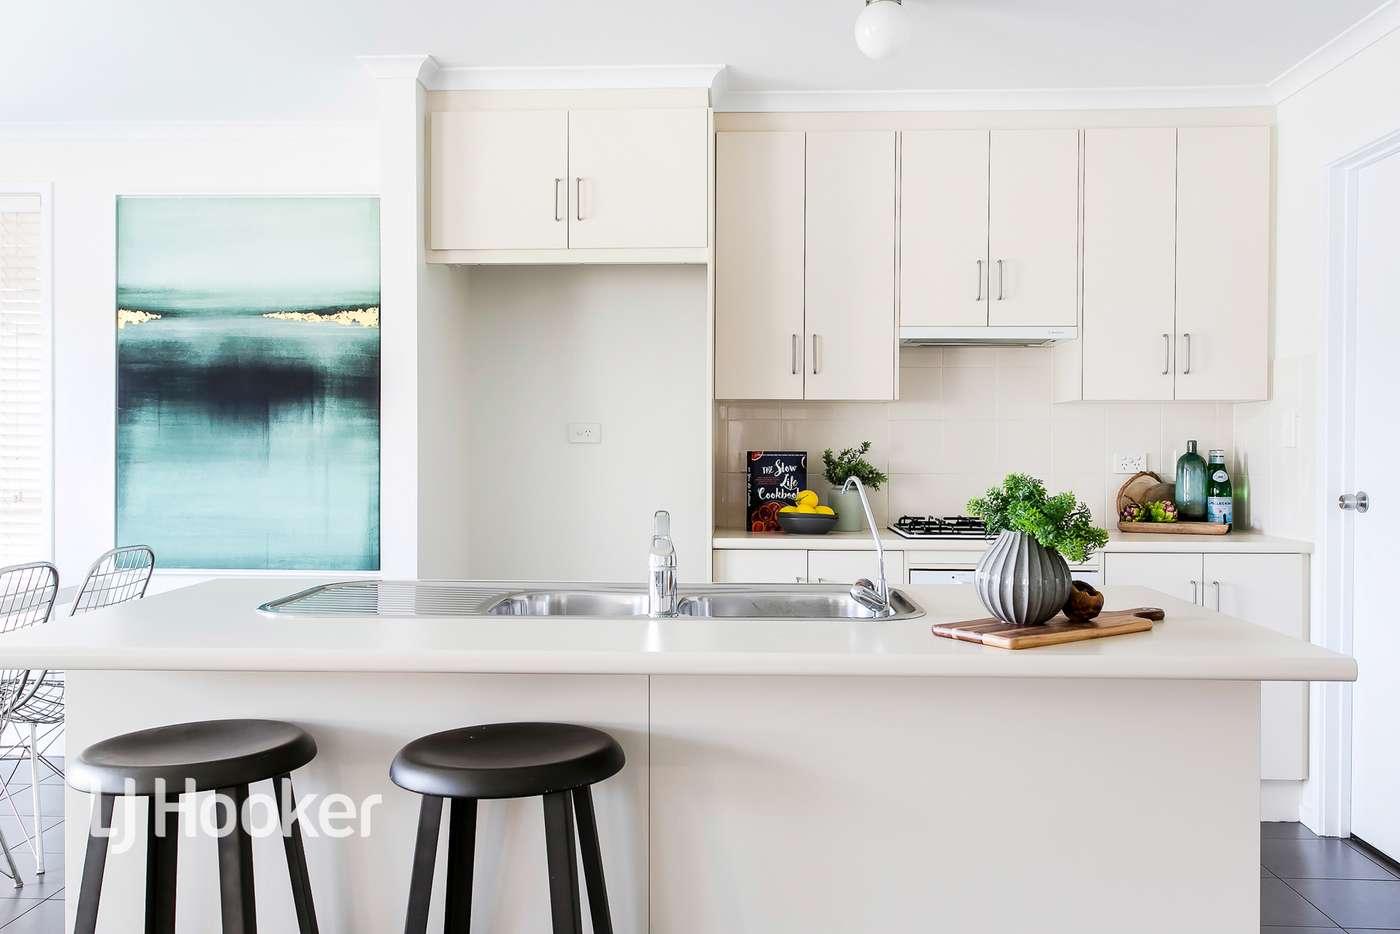 Fifth view of Homely house listing, 54 William Langman Circuit, Ridleyton SA 5008